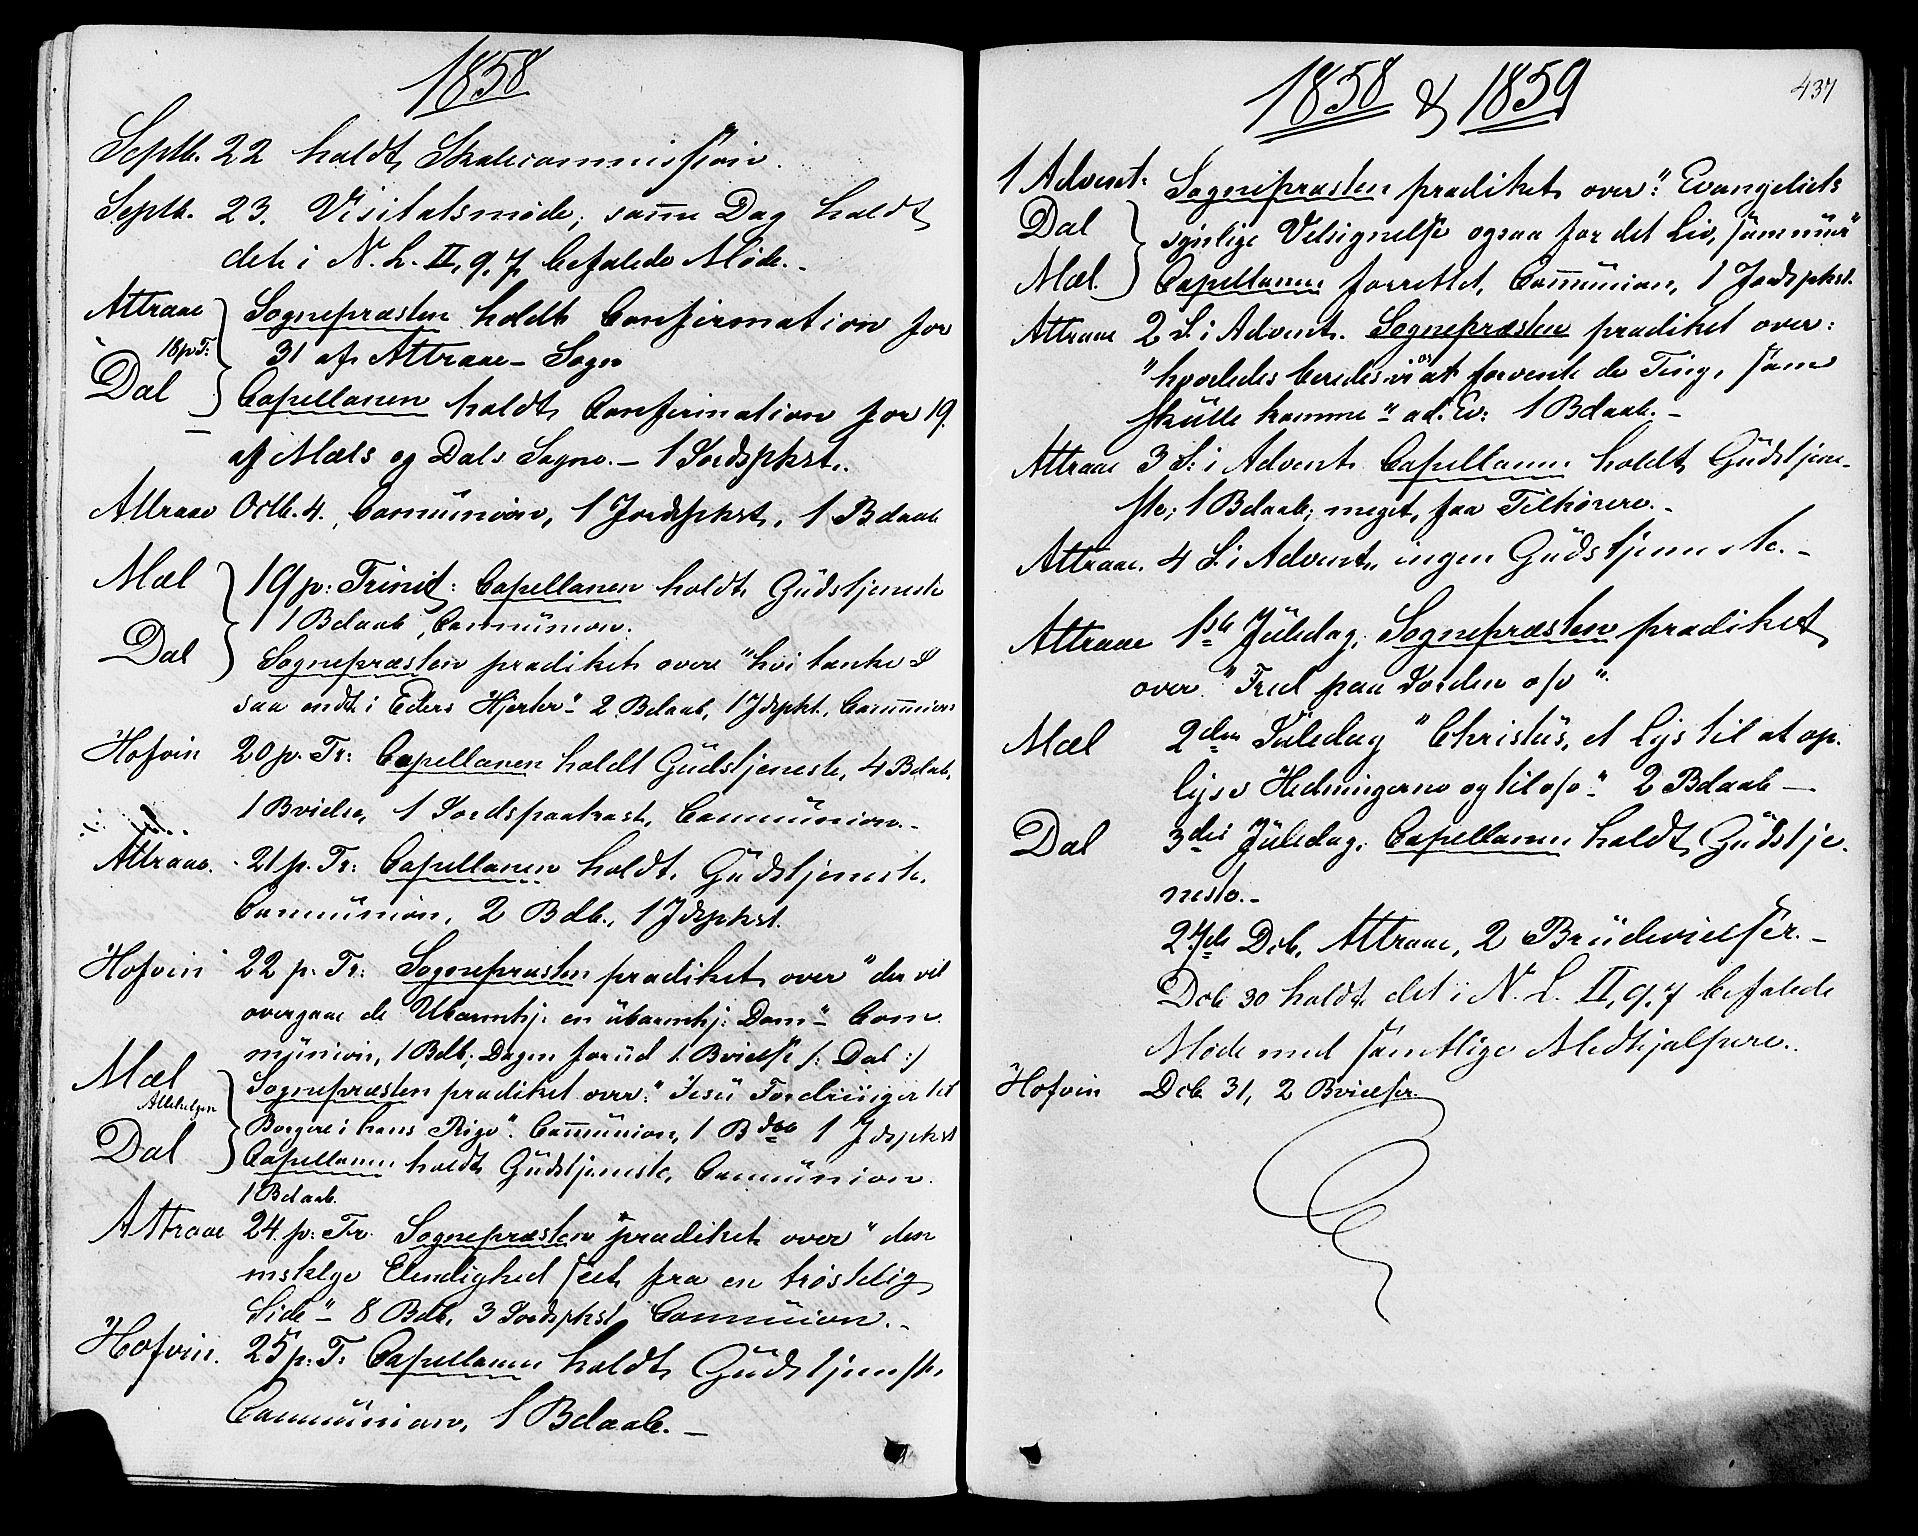 SAKO, Tinn kirkebøker, F/Fa/L0006: Ministerialbok nr. I 6, 1857-1878, s. 437